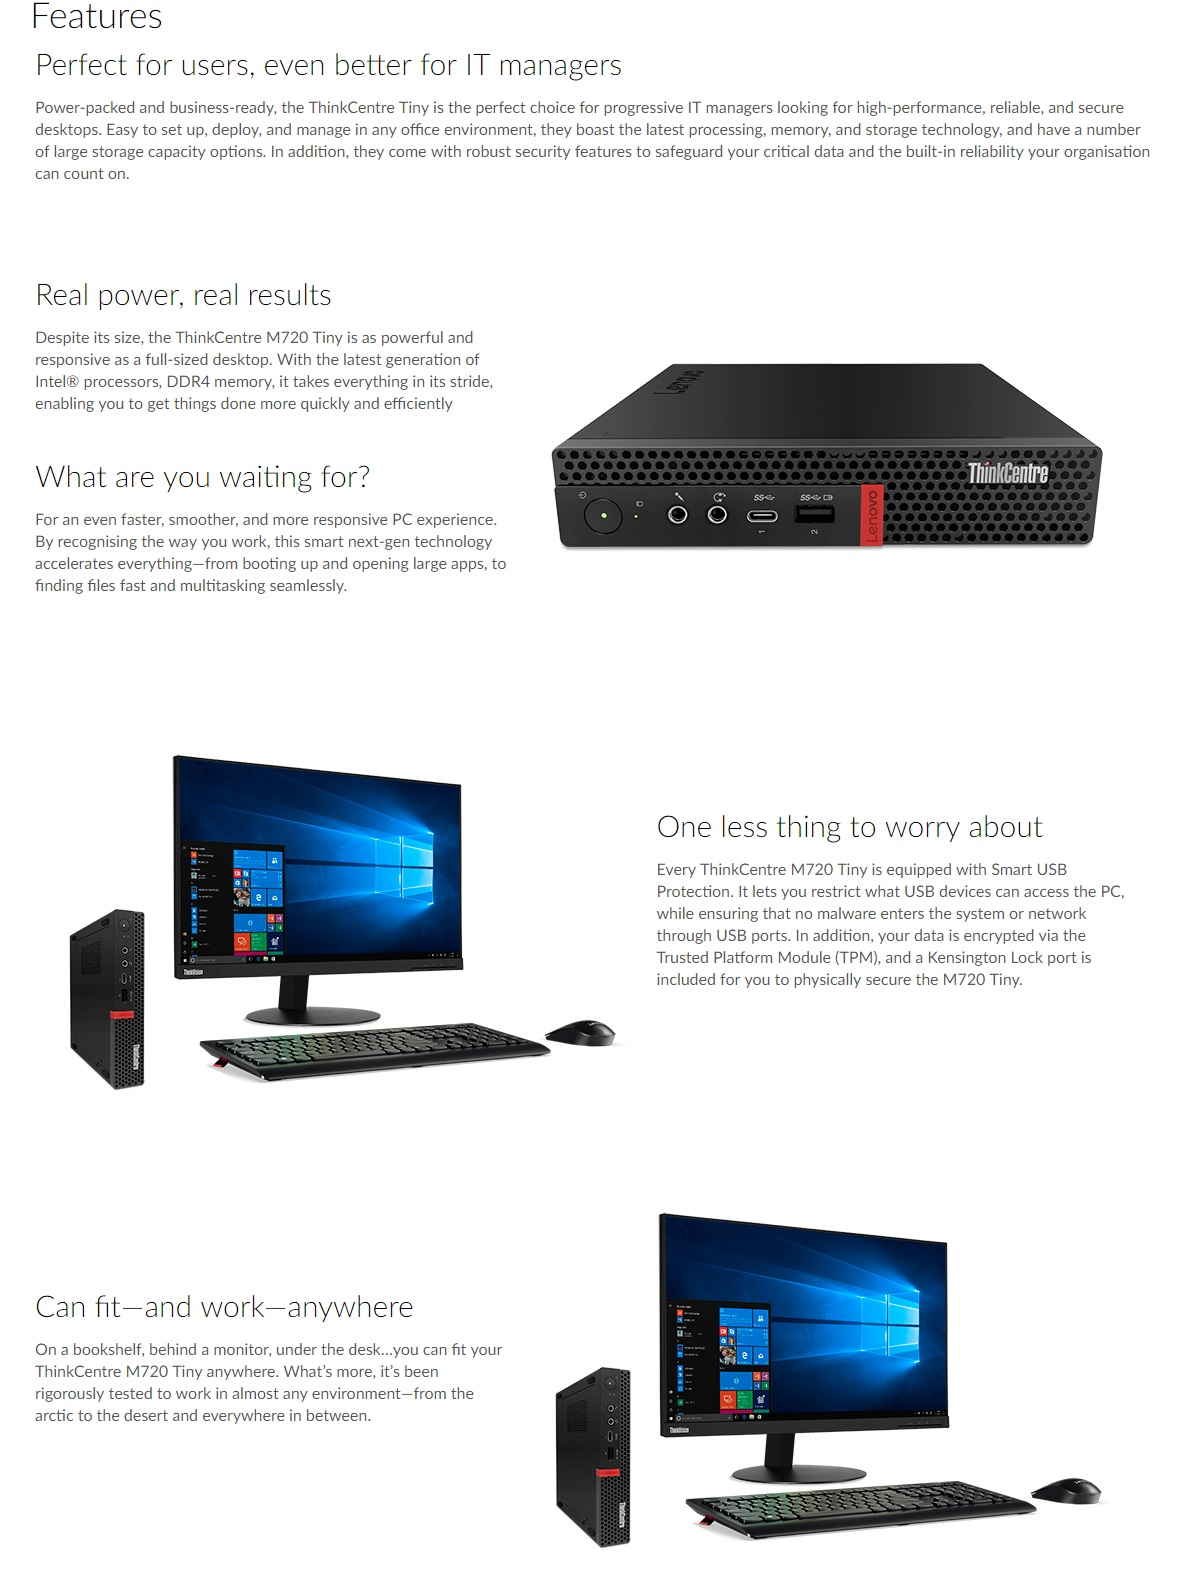 Lenovo ThinkCentre M720 Tiny i5-8400T 8GB 256GB SSD W10P Desktop PC